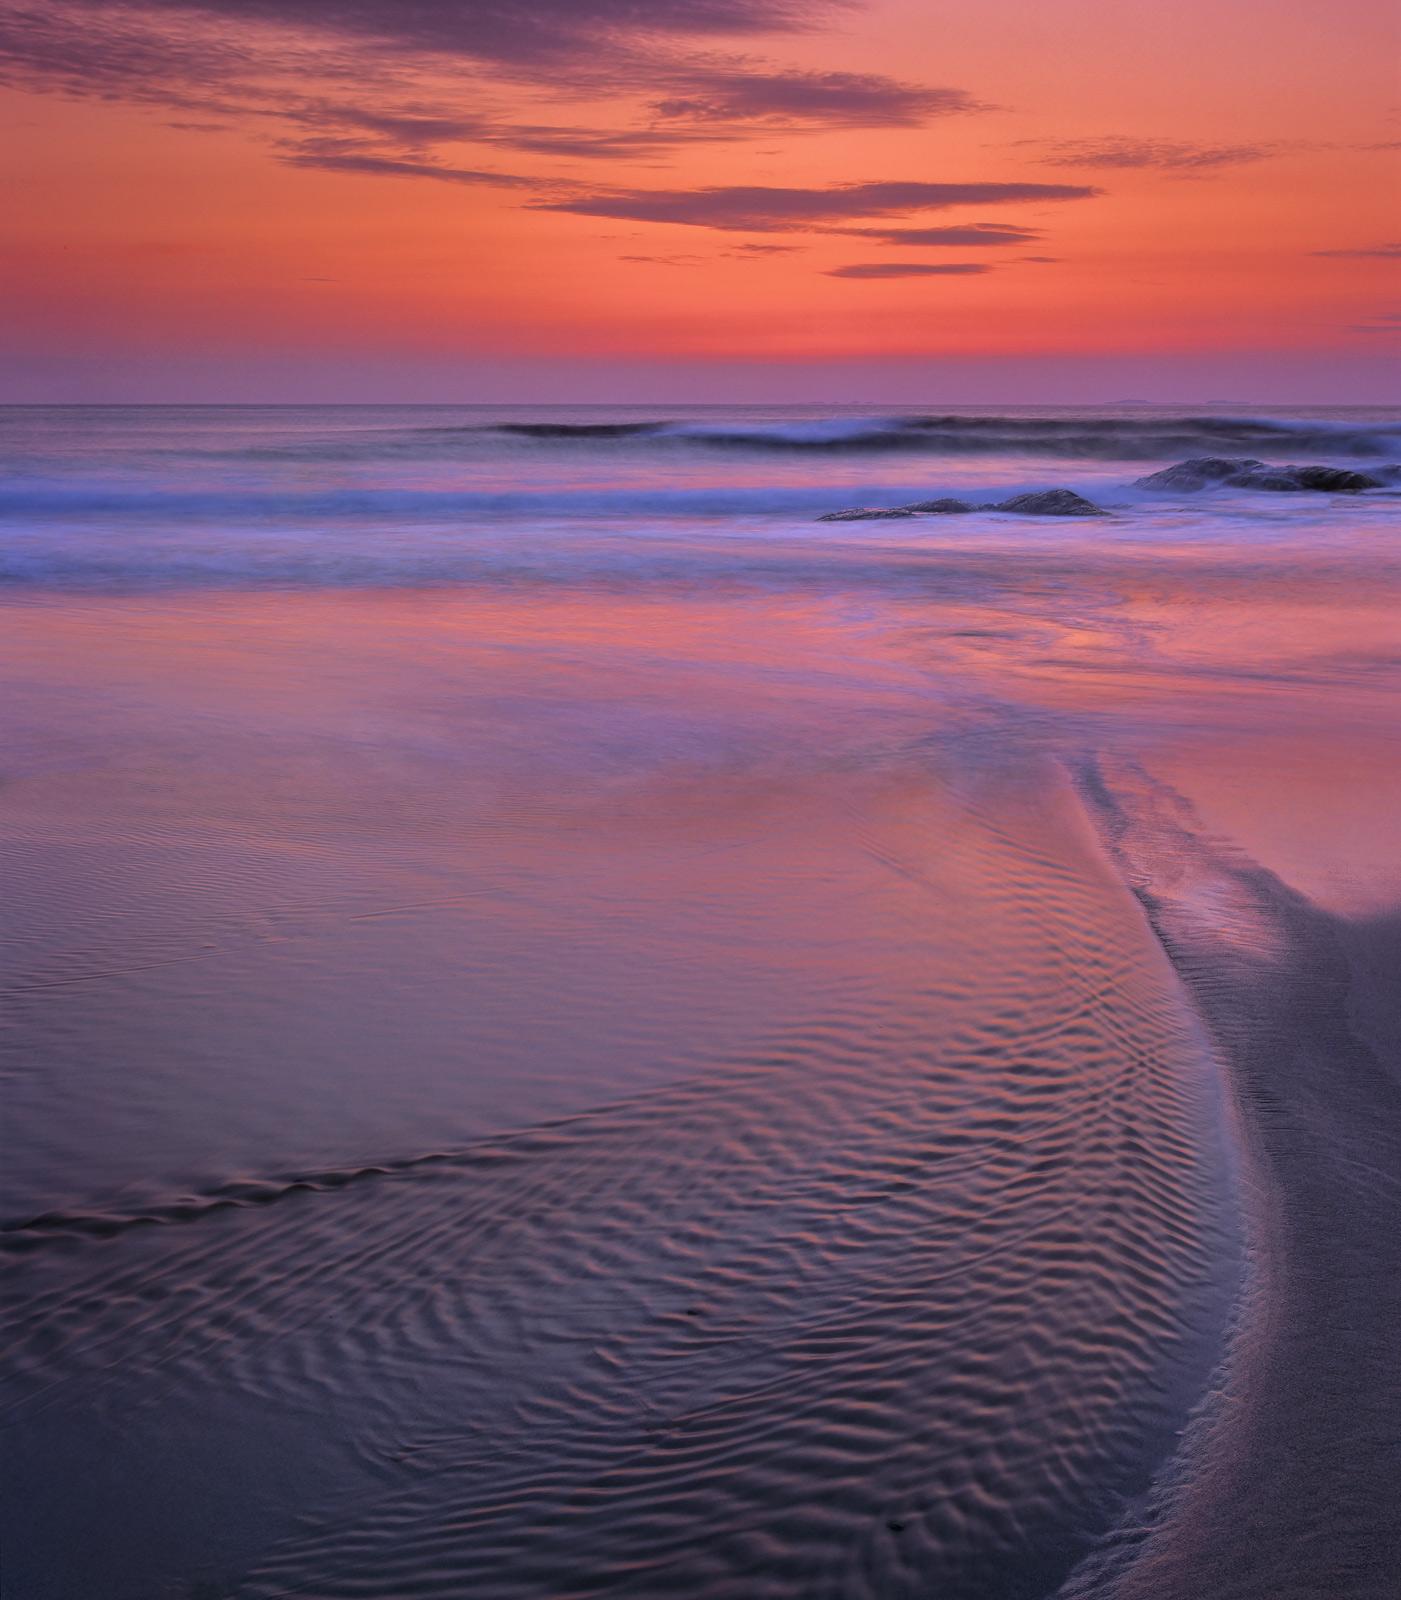 Hosta Sunset, Hosta, North Uist, Scotland, sand dunes, stream, cutting, sandy, beach, geological, rocks, red, sunset, pa, photo